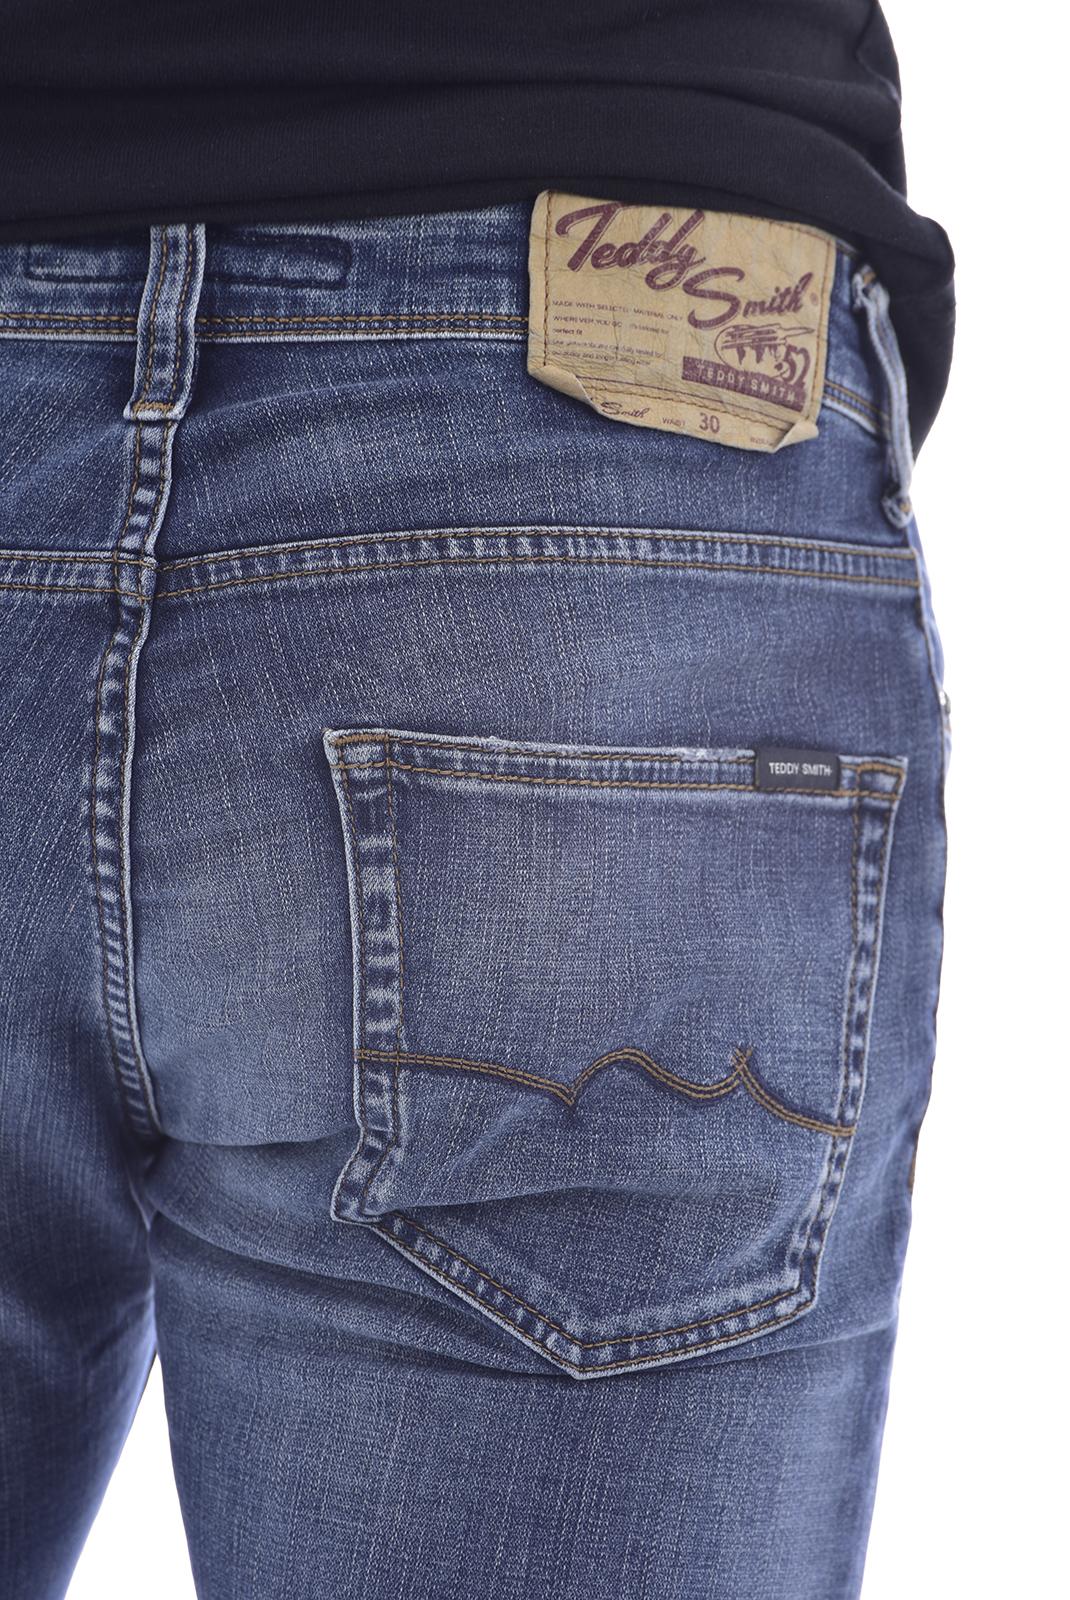 Shorts & Bermudas  Teddy smith SCOTT REG 325-OLD/ENCRE